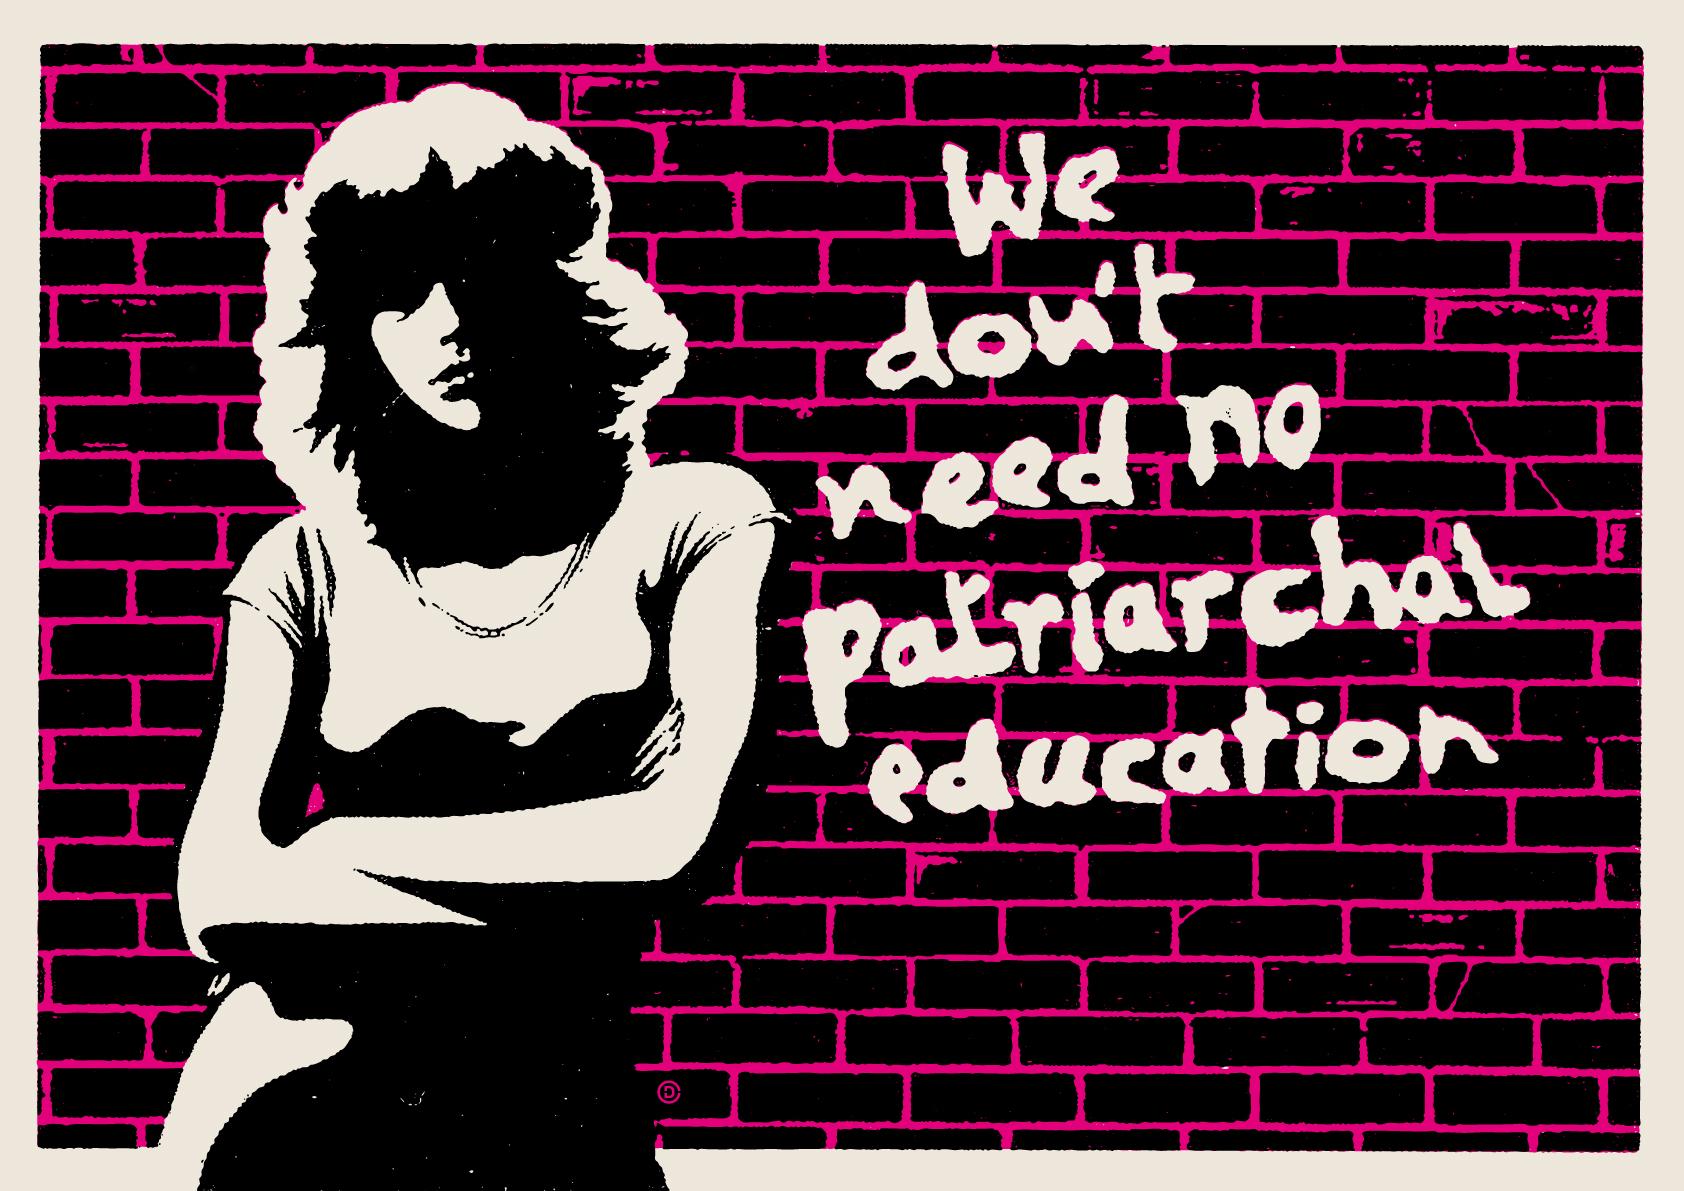 patriarchal edu